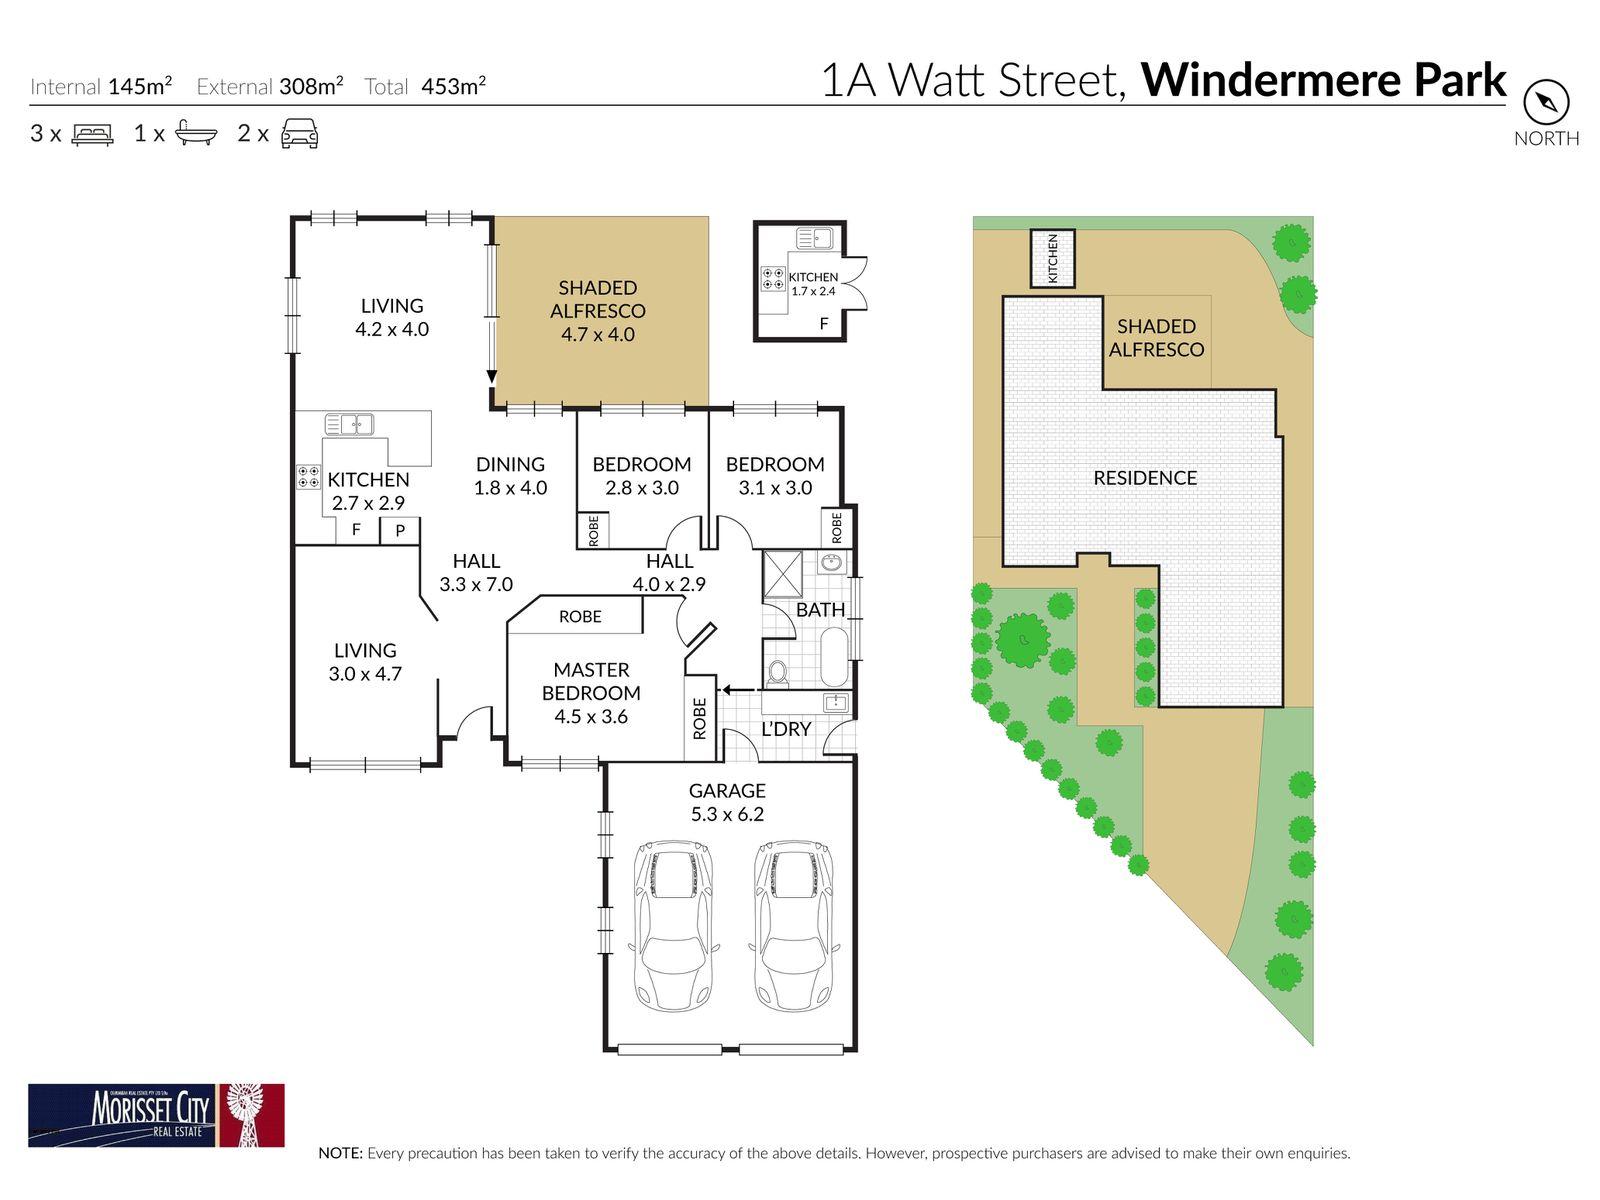 1A Watt Street, Windermere Park